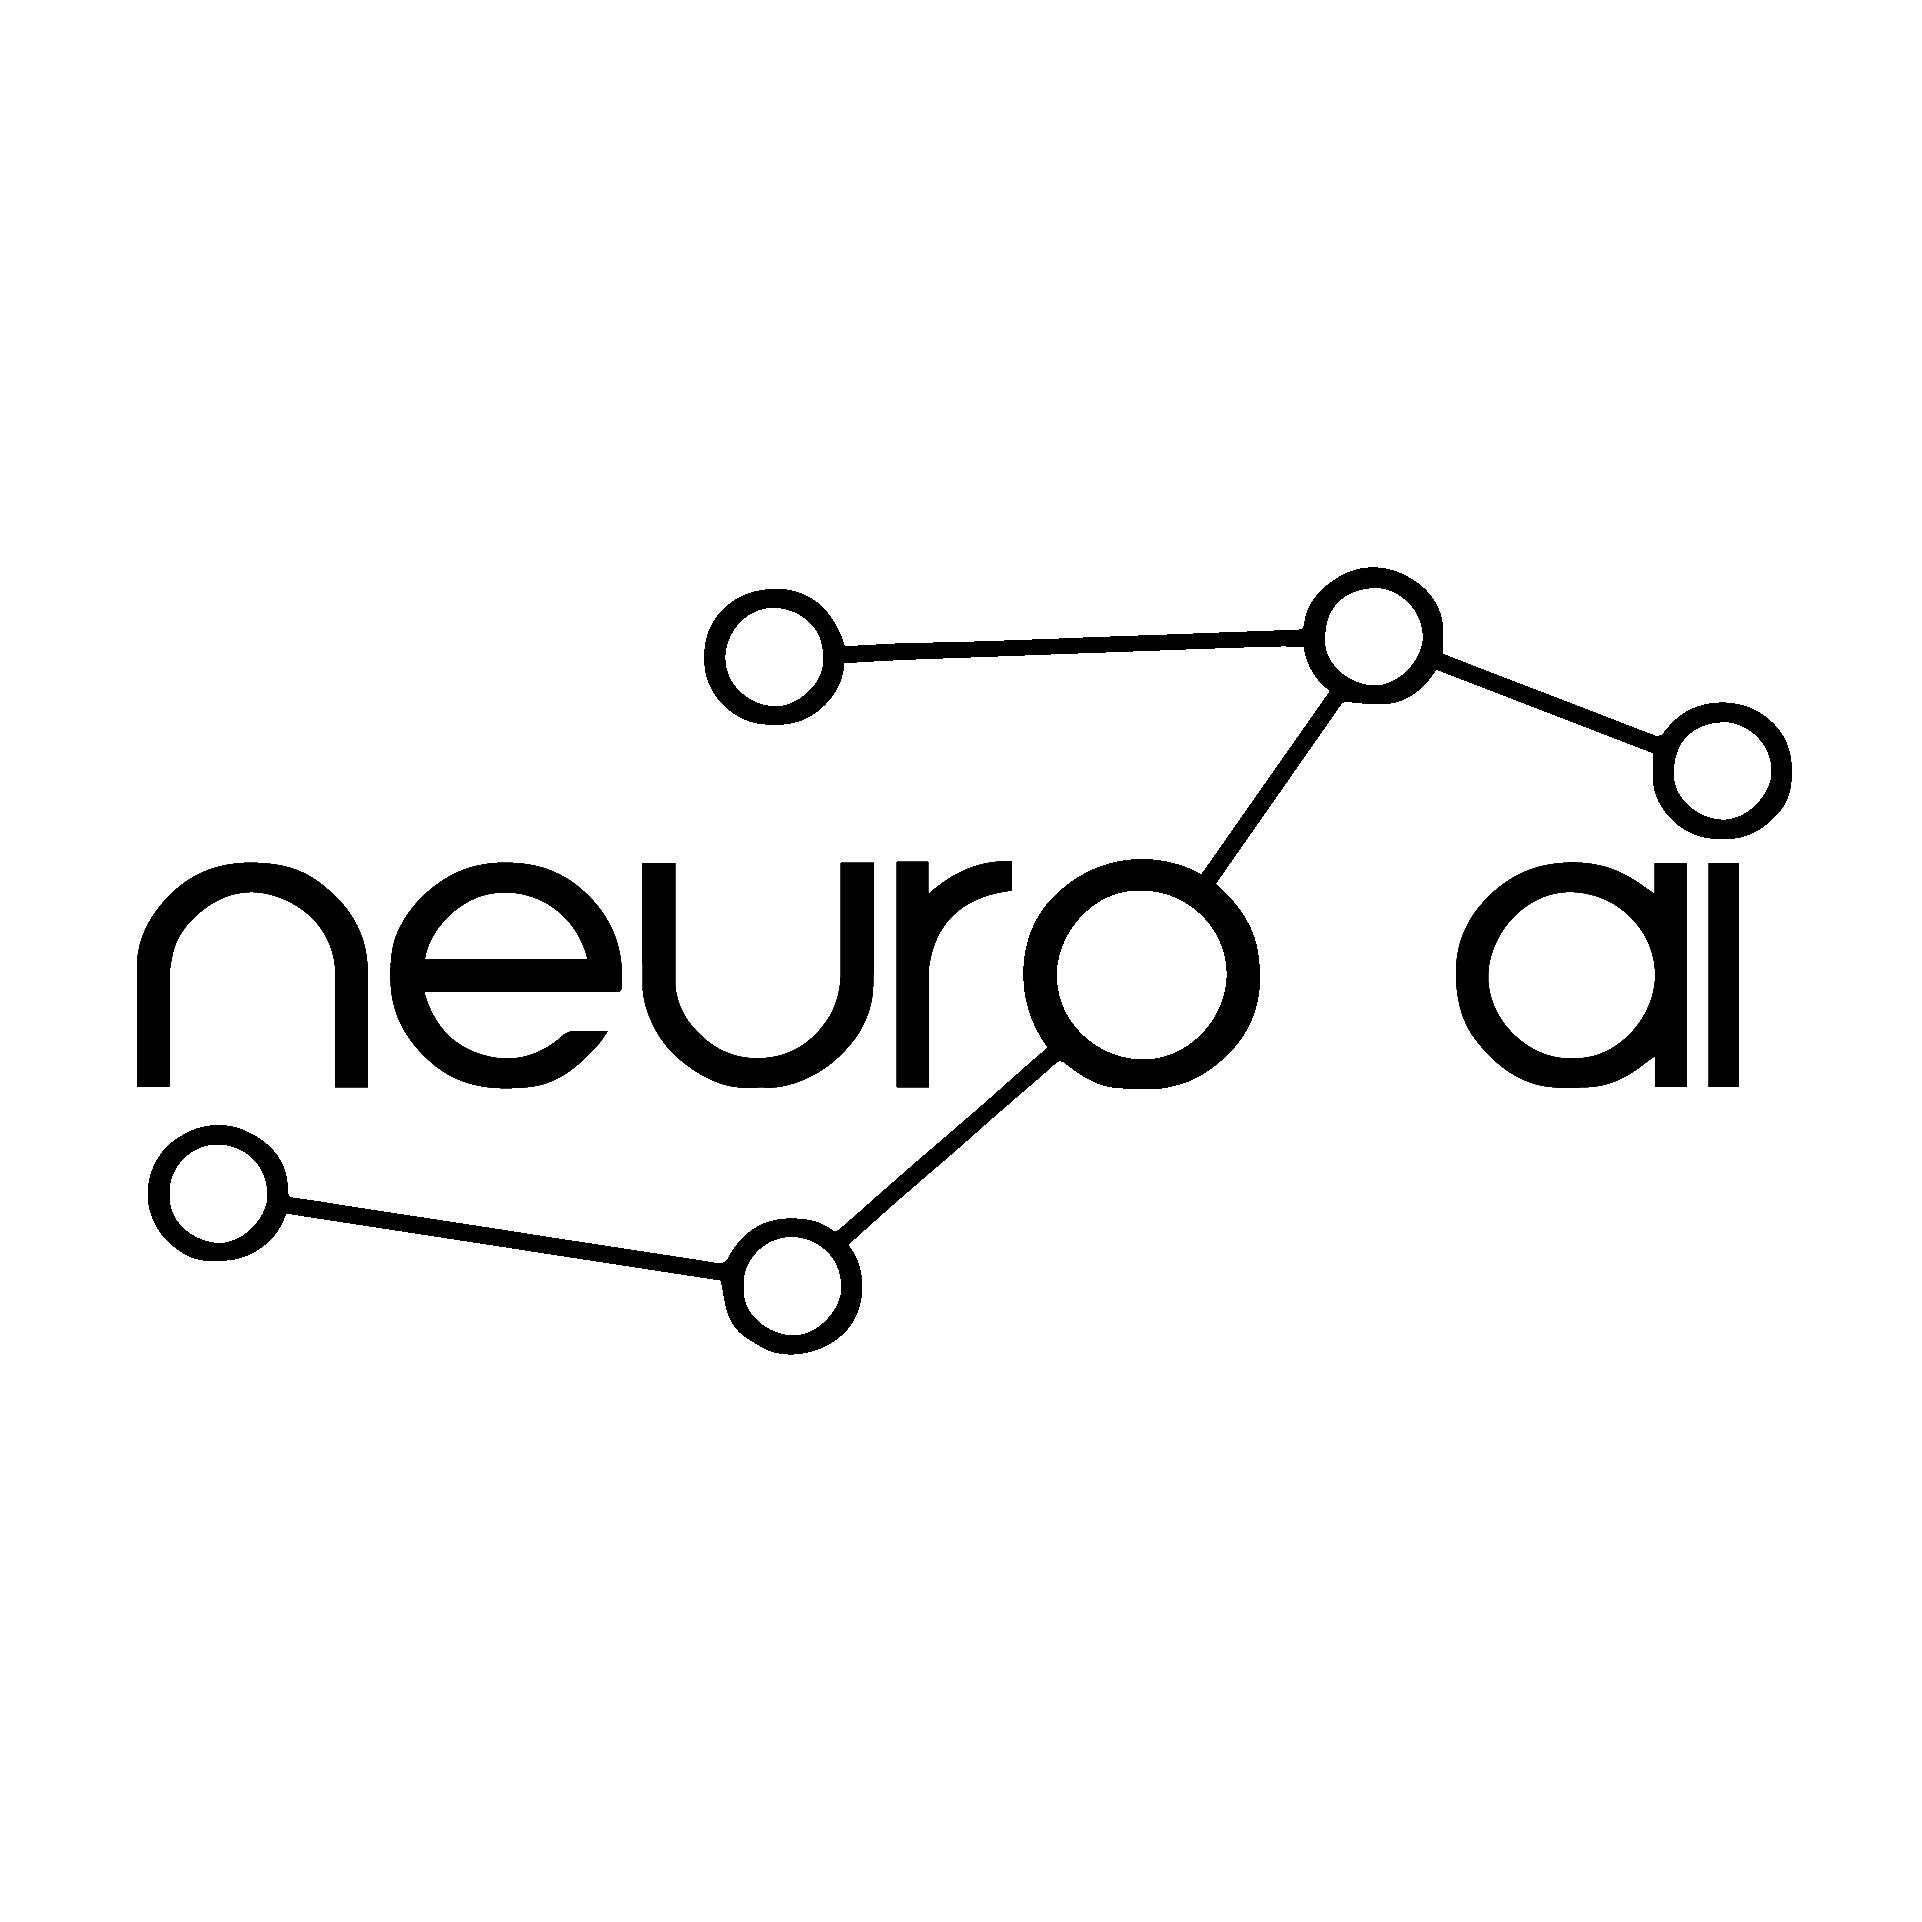 NeuroAIlogo.png